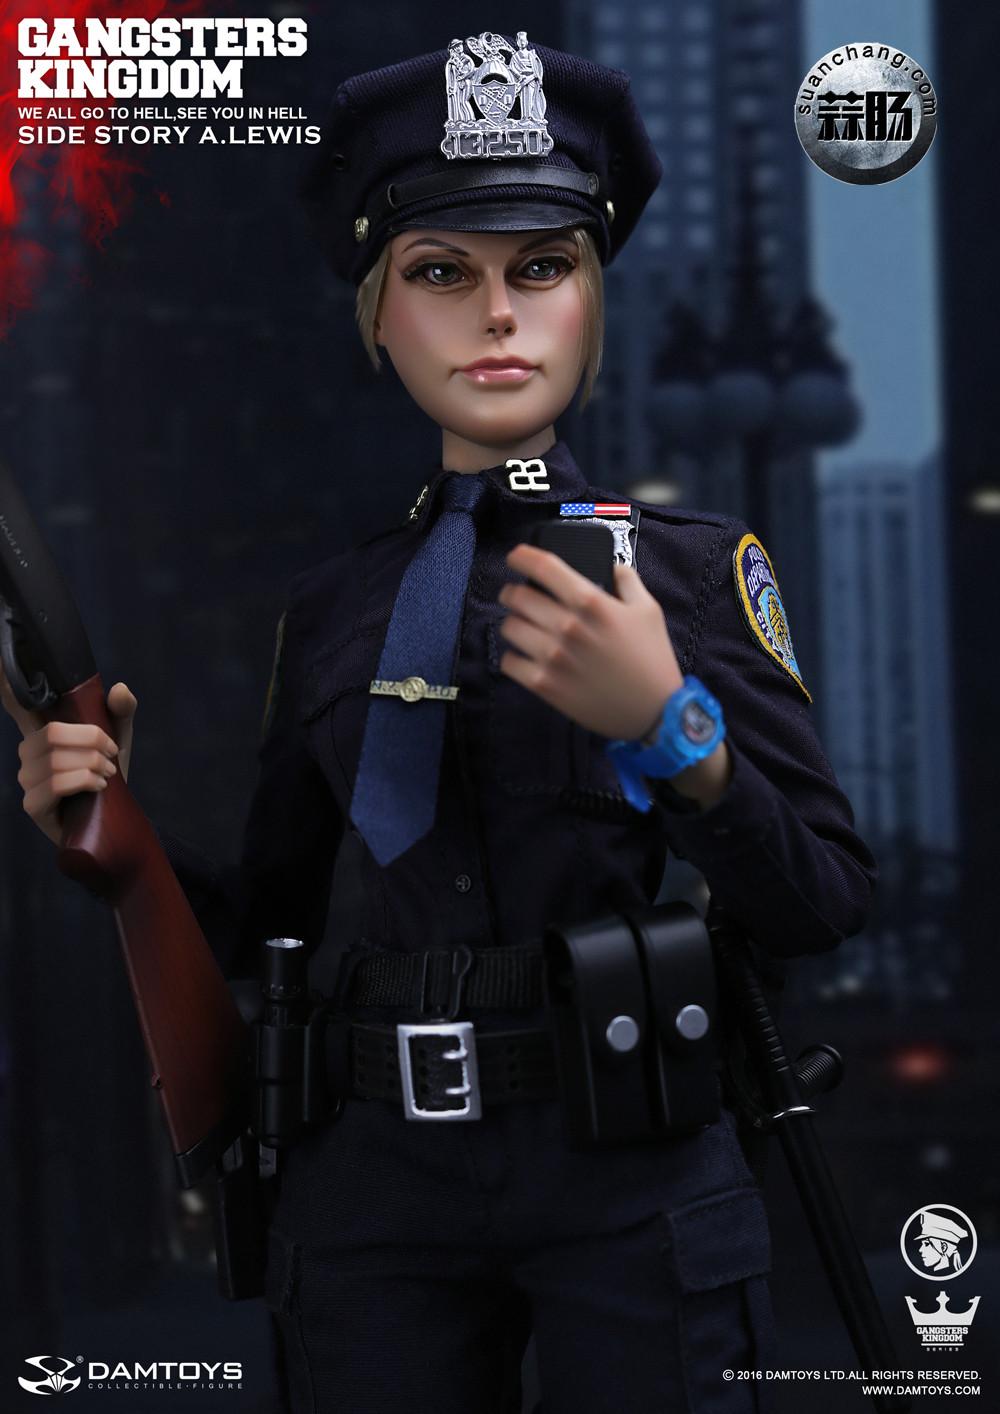 DAMTOYS 1/6黑帮王国系列 番外篇:安妮·刘易斯 警官 模玩 第5张